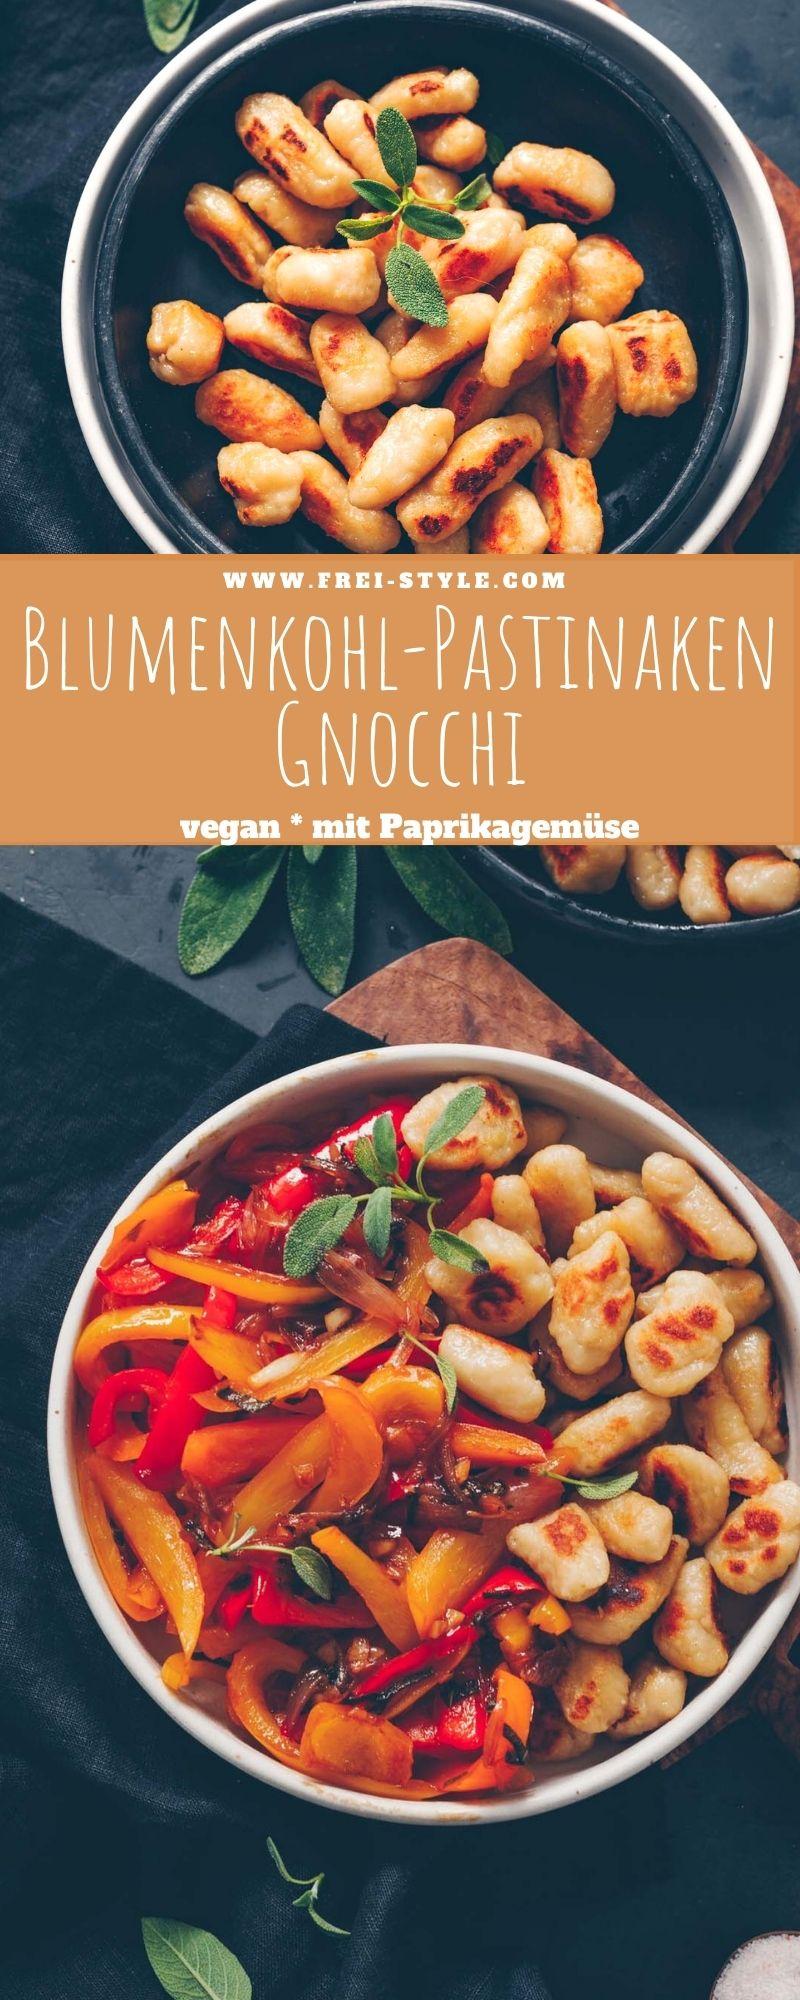 Blumenkohl-Pastinaken Gnocchi